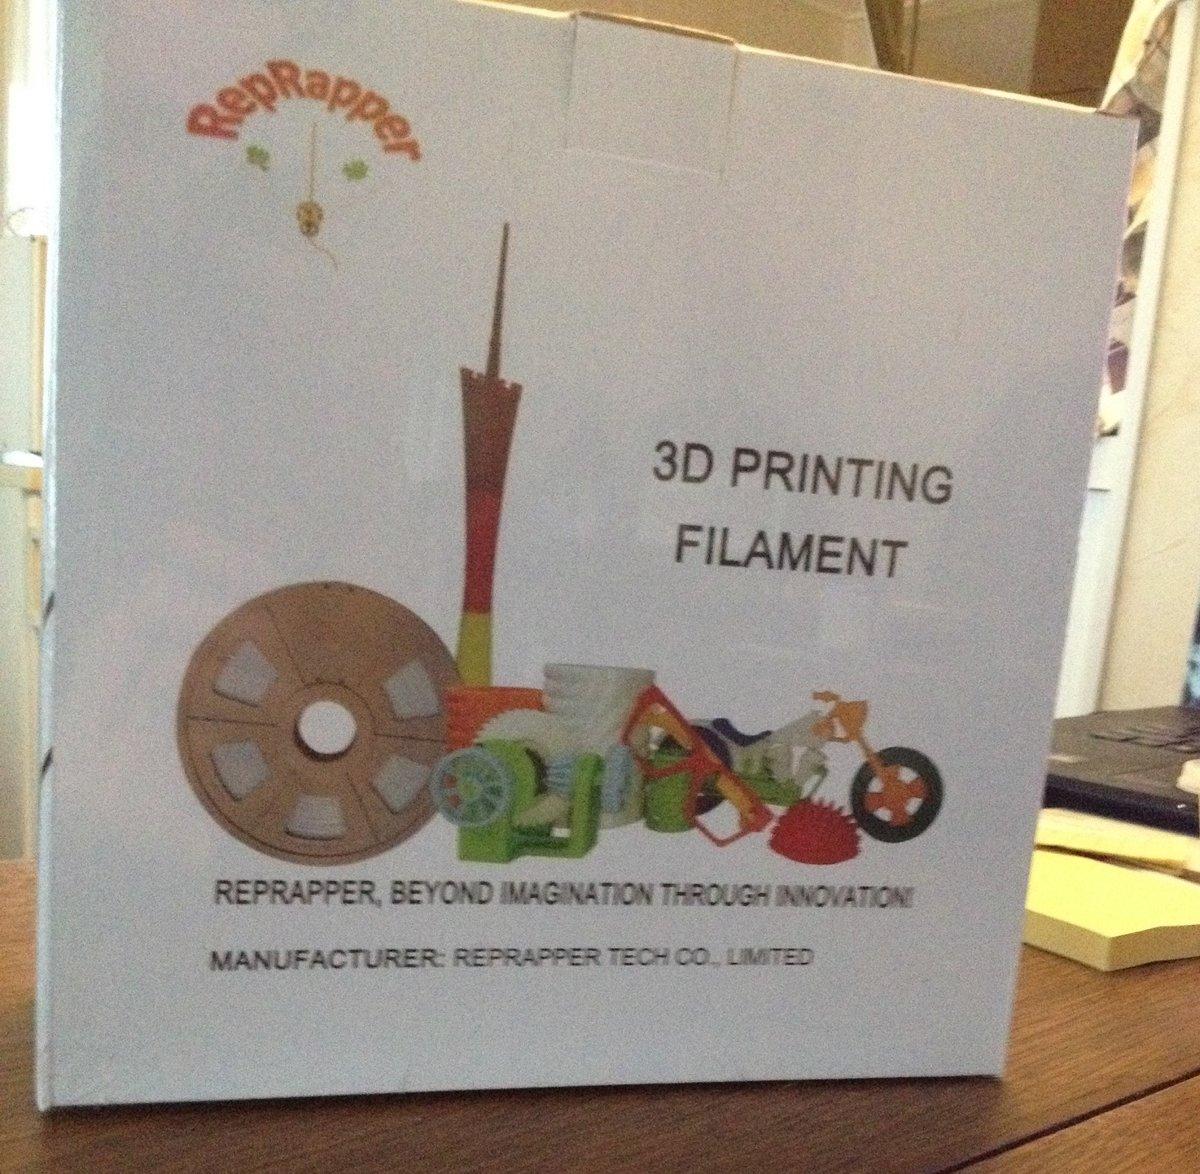 1 75mm rood pla filament